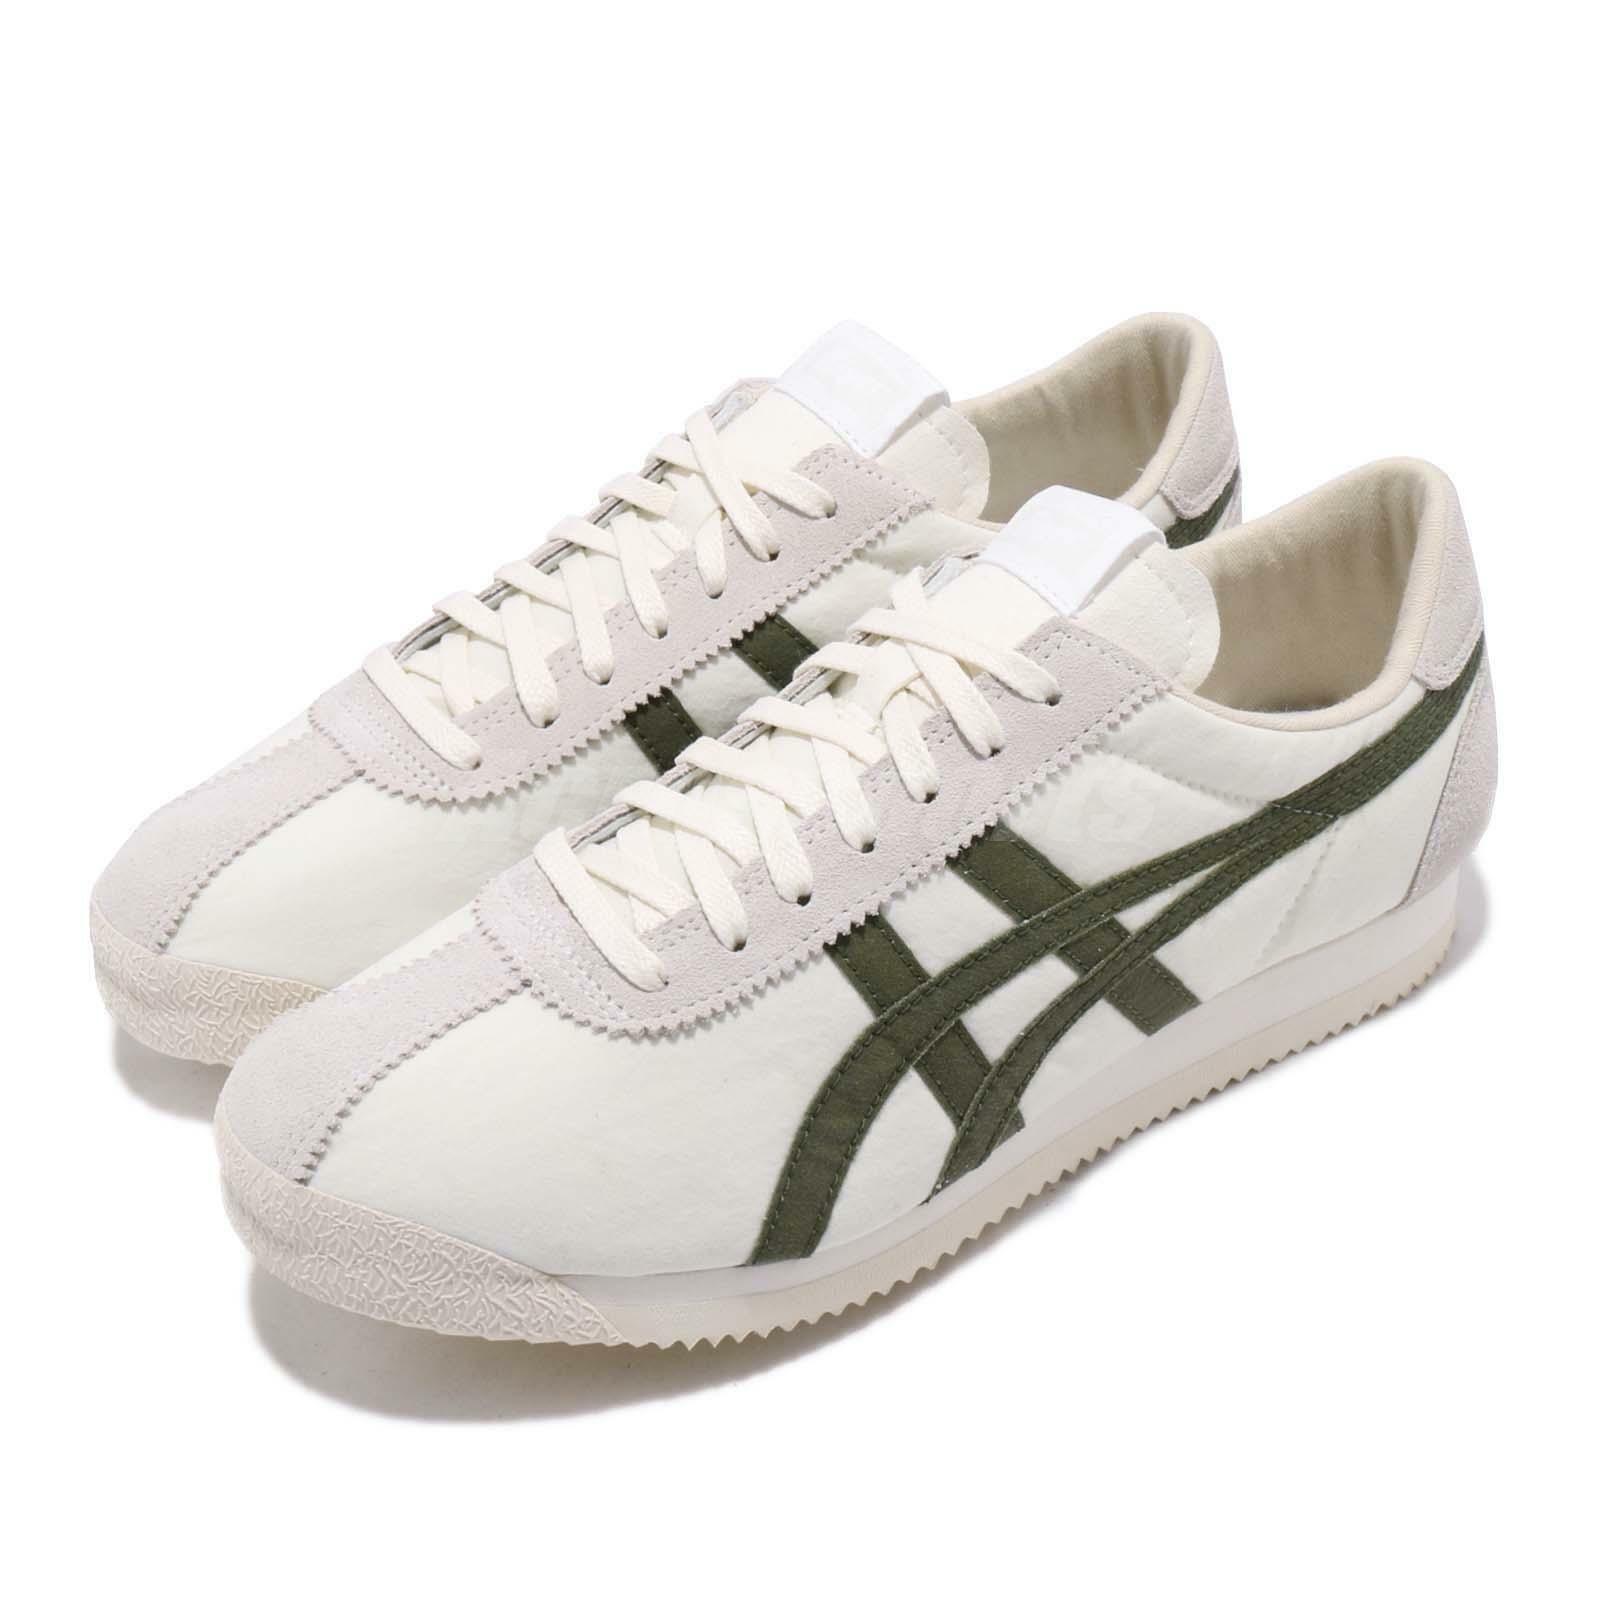 Asics Onitsuka Tiger Corsair Rice Olive Green Men Women Casual shoes 1183A344-100